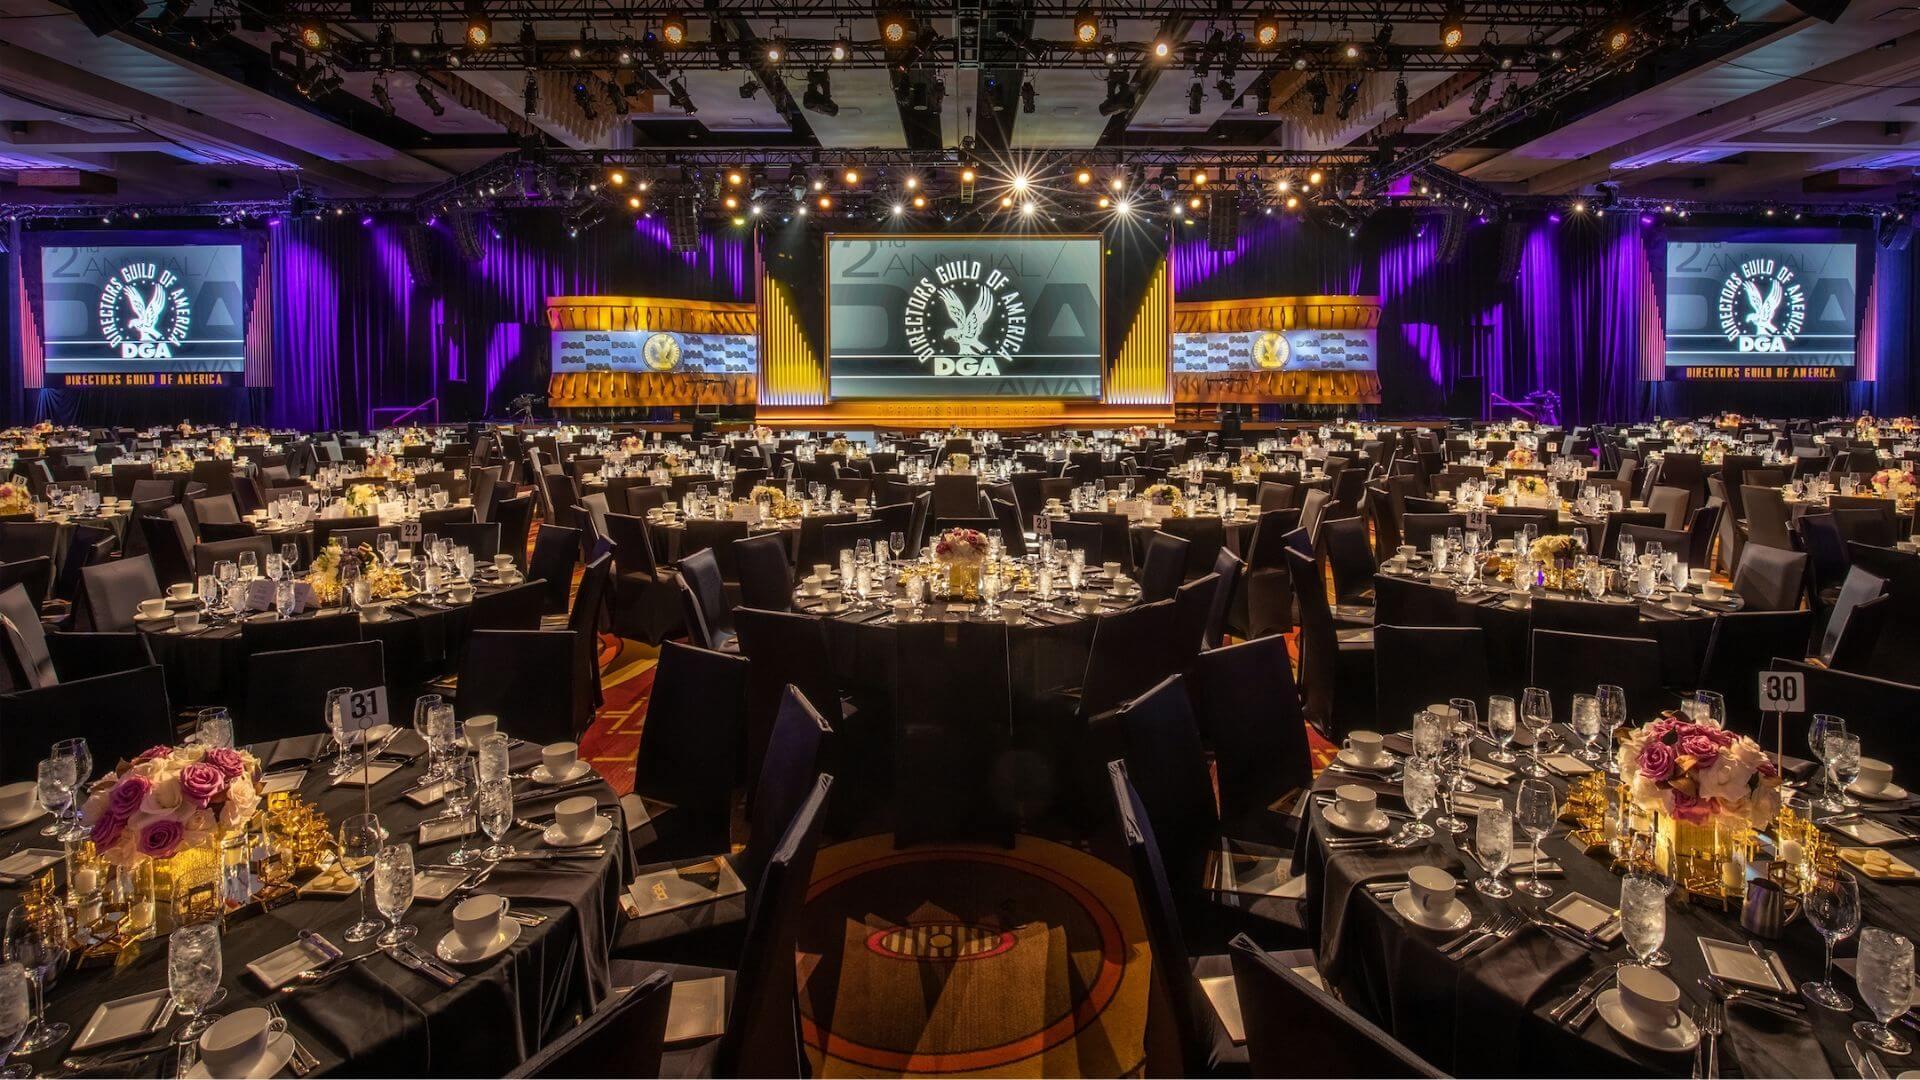 72nd Annual DGA Awards JG2 Collective